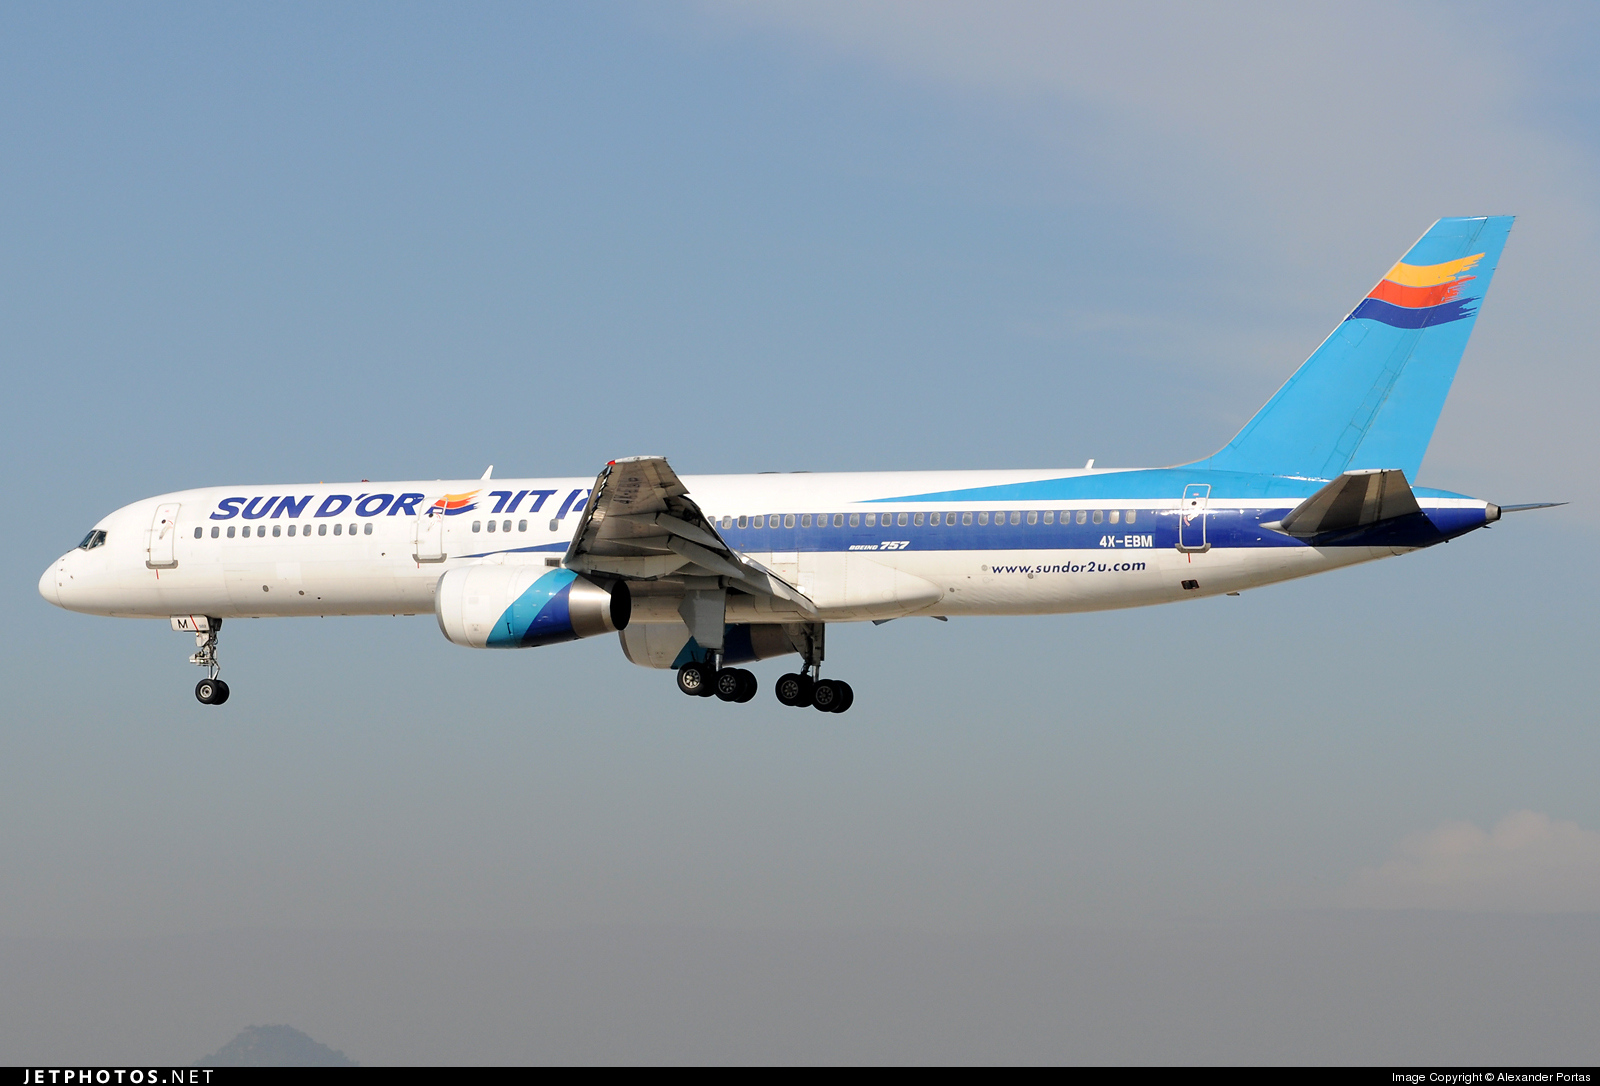 4X-EBM - Boeing 757-258 - Sun d'Or International Airlines